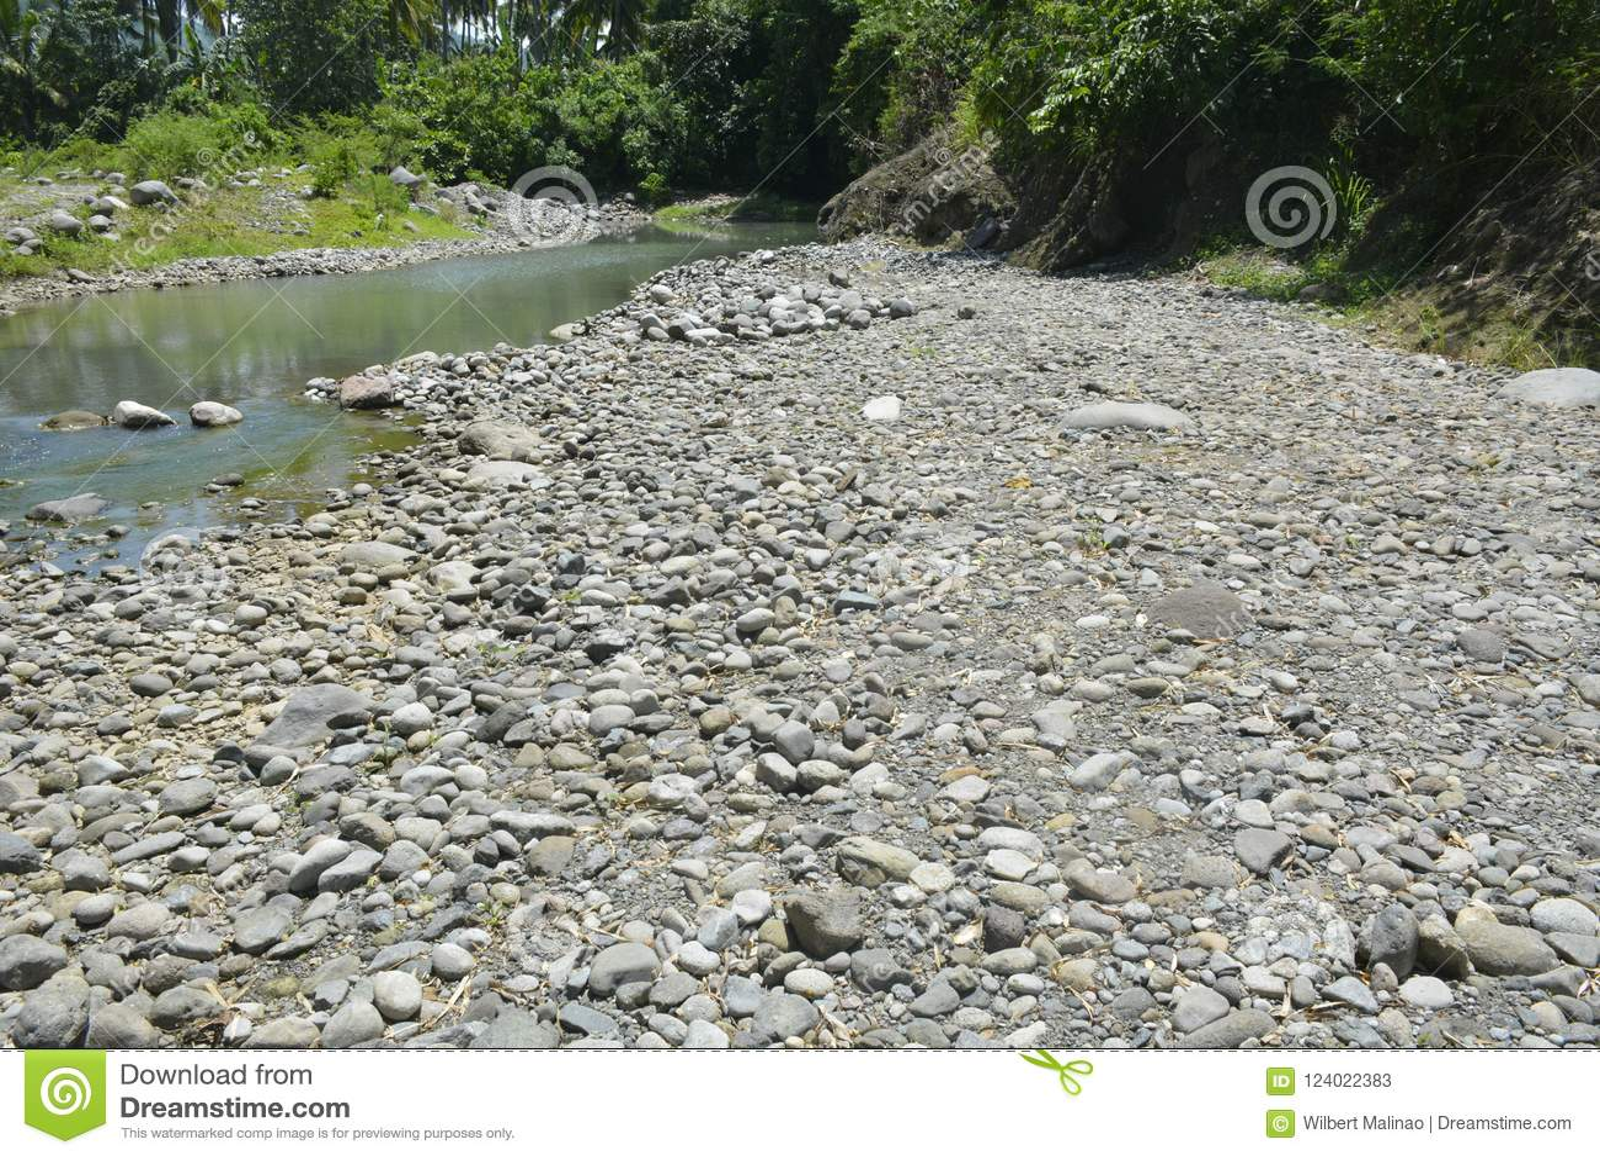 Ruparan河岸, Digos市,南达沃省,菲律宾的被淤积的部分在barangay Ruparan的